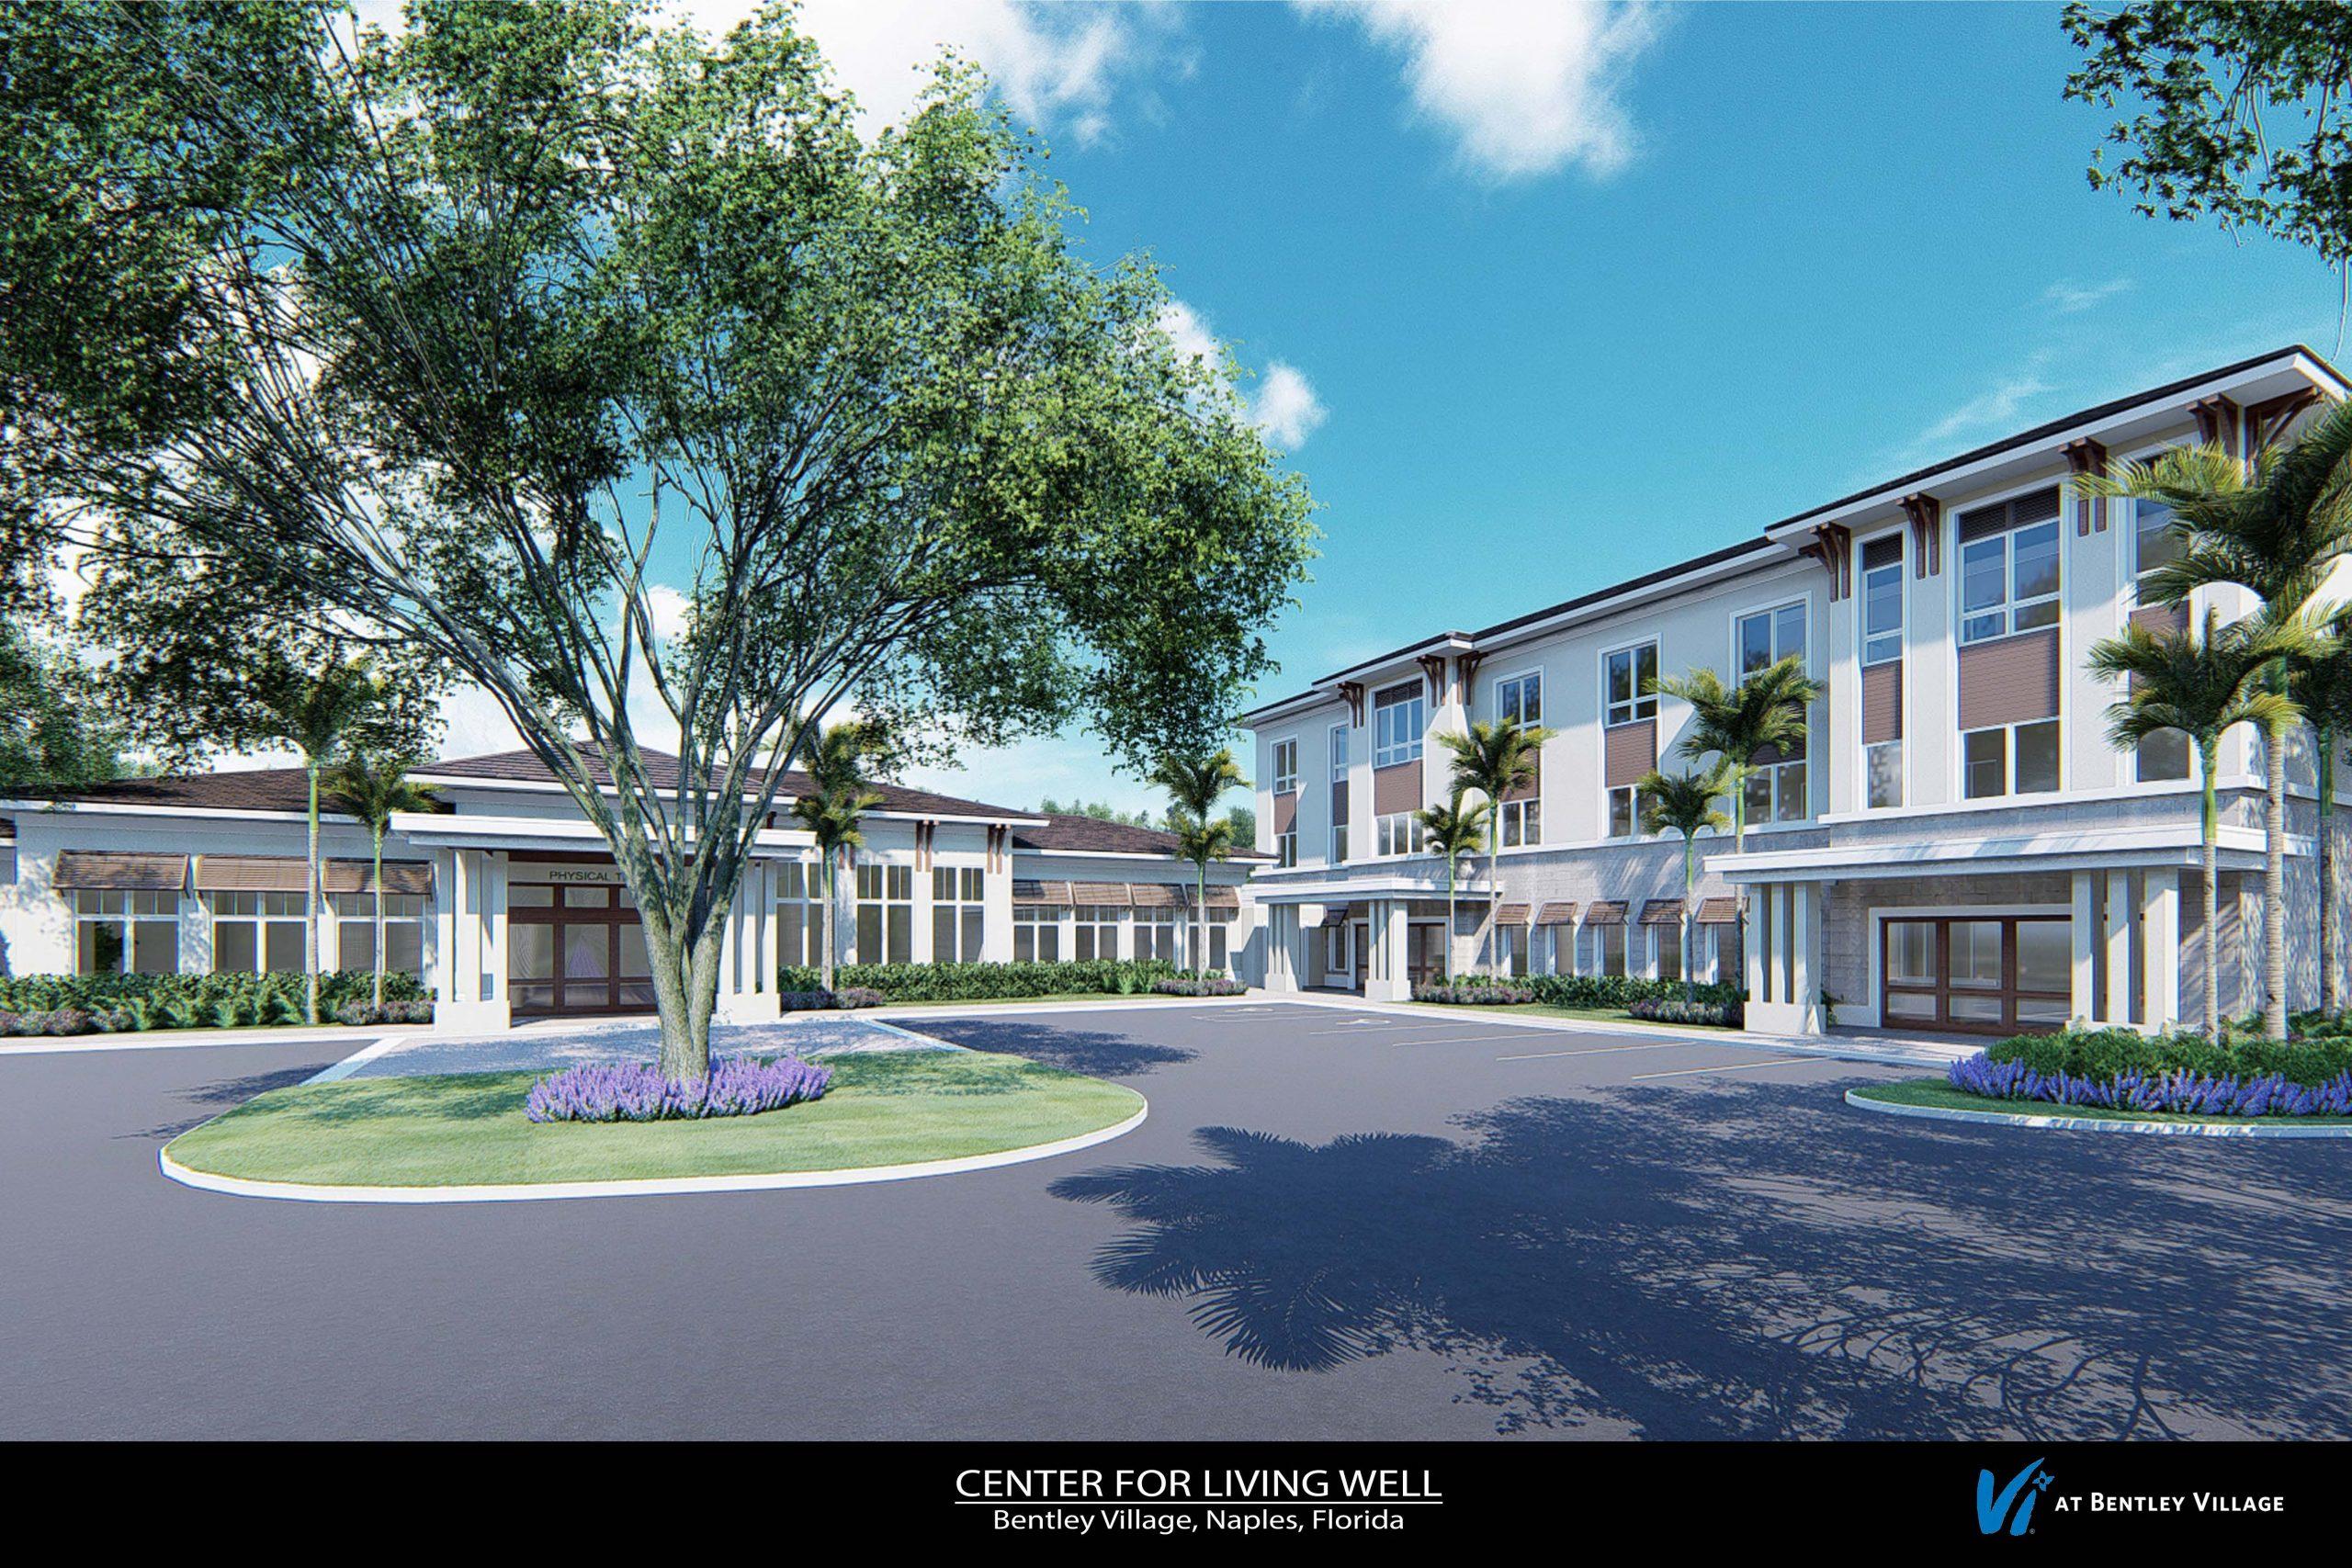 Bentley Village Center for Living Well